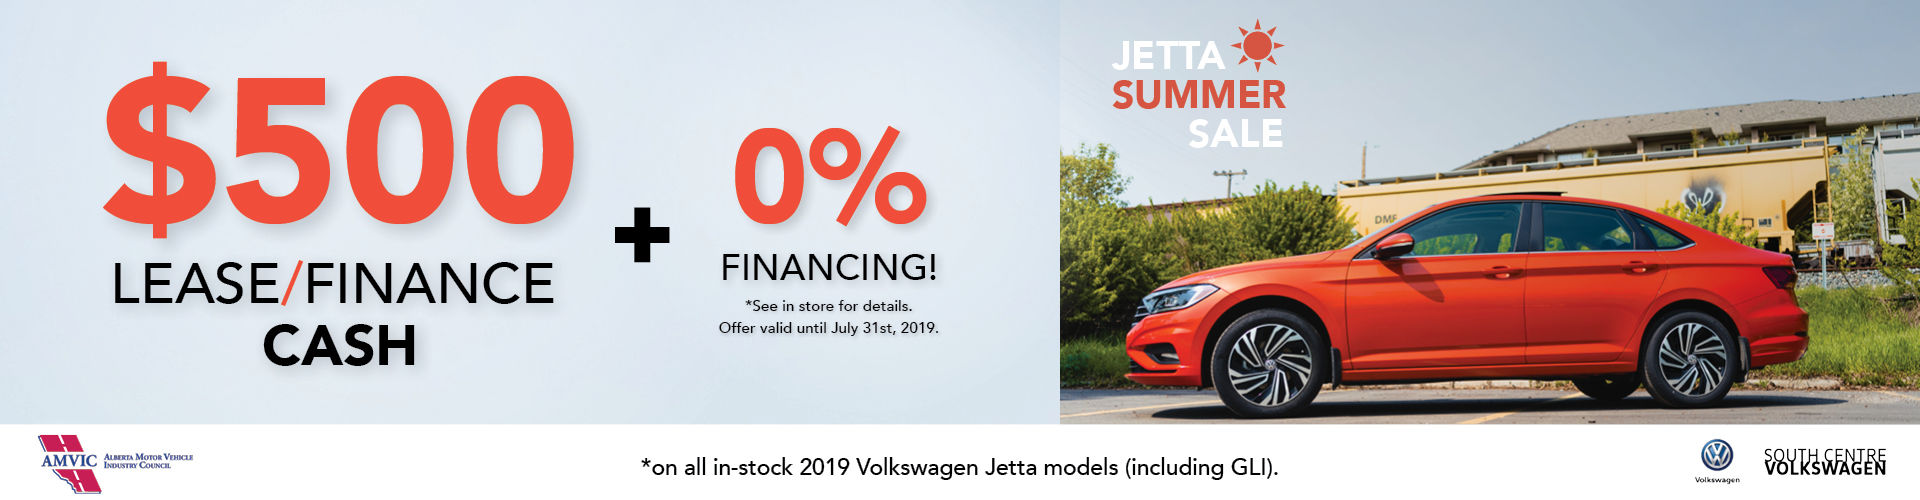 Jetta Summer Sale | South Centre